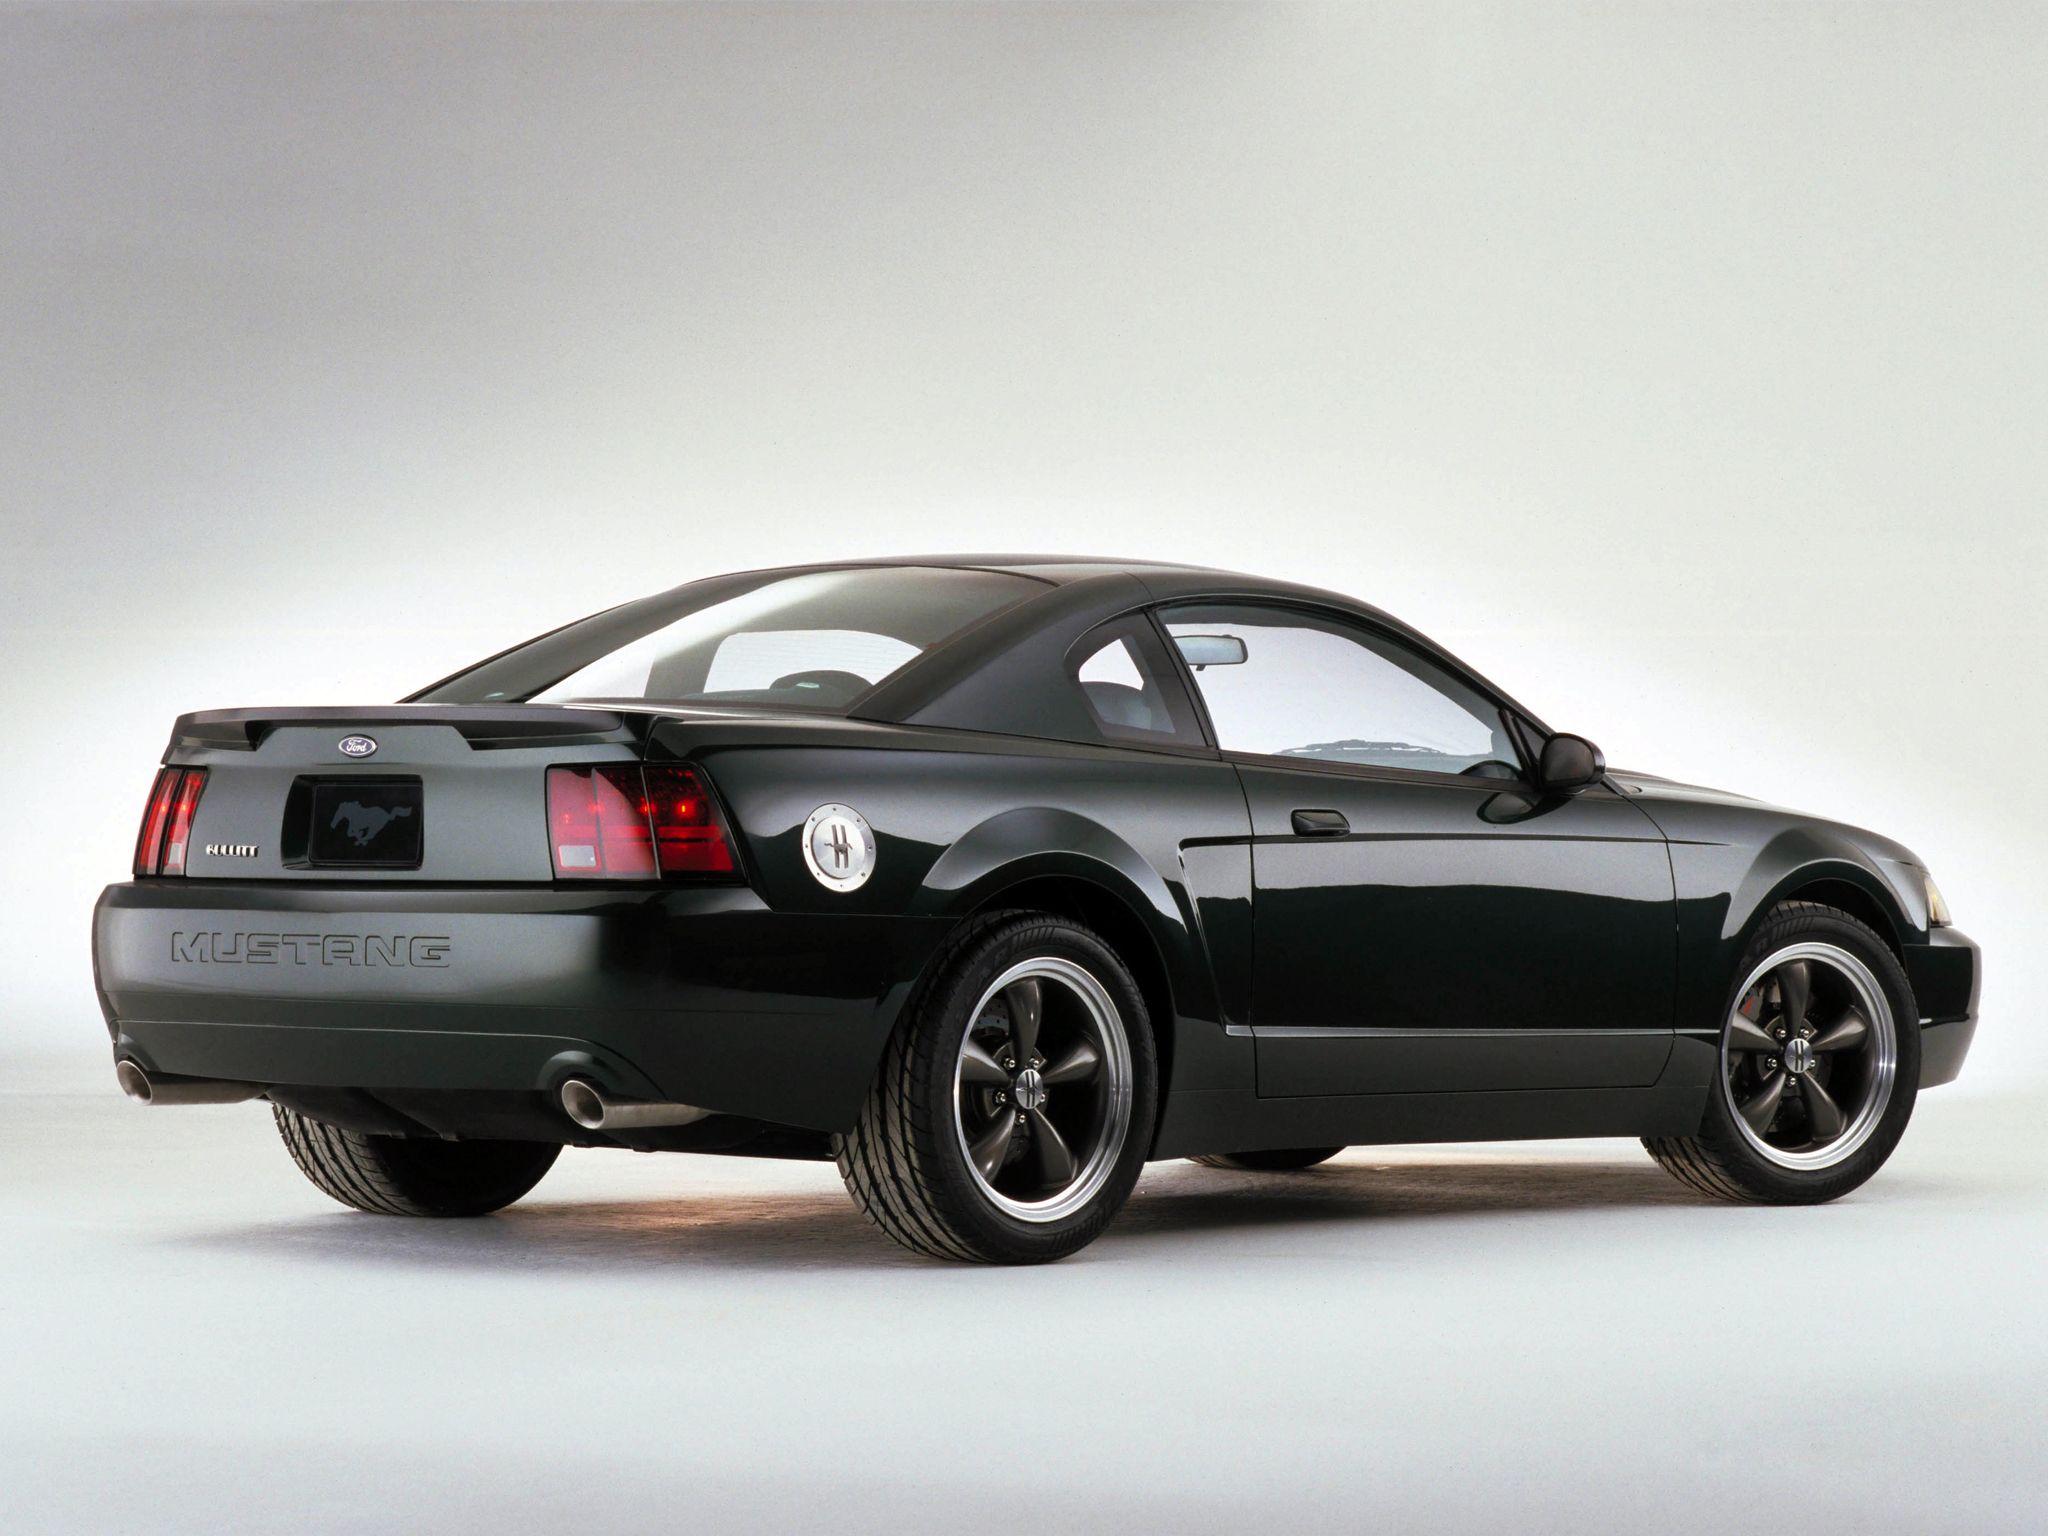 2000 Bullitt Gt Concept Mustang Bullitt Ford Mustang Bullitt Mustang